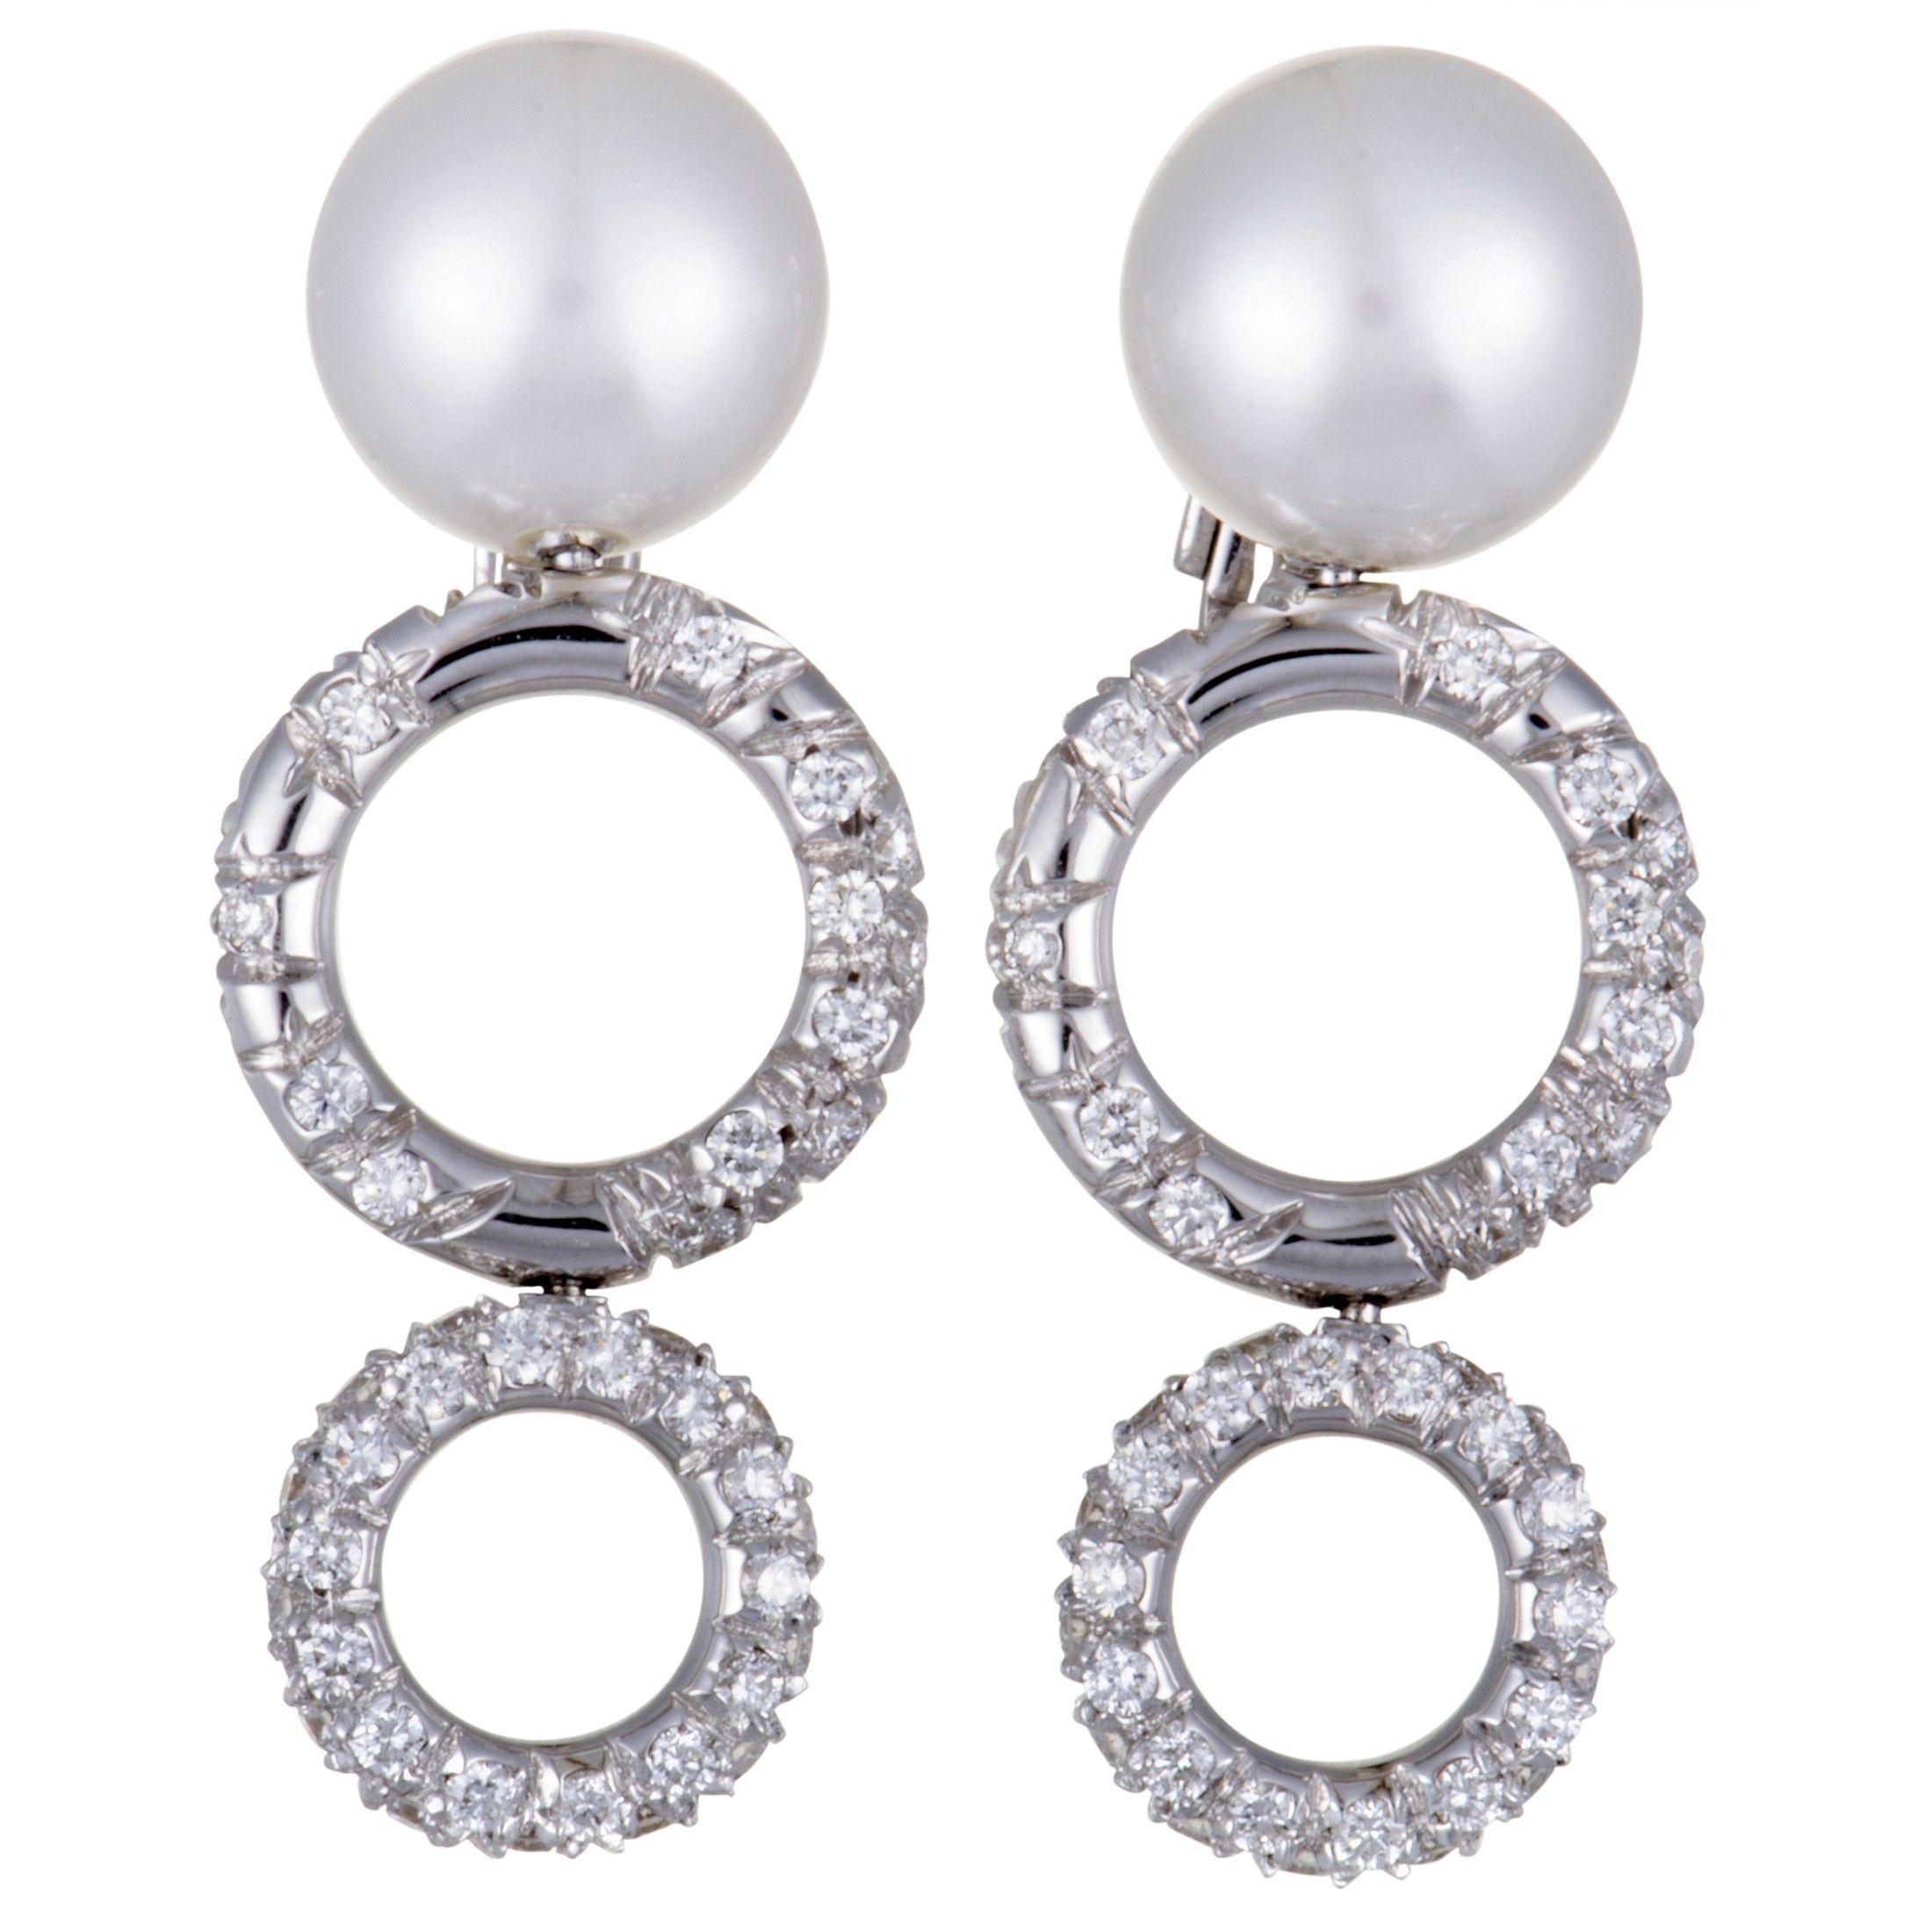 Mikimoto 18k White Gold Diamond And 10 0 11 0mm Pearl Dangle Earrings